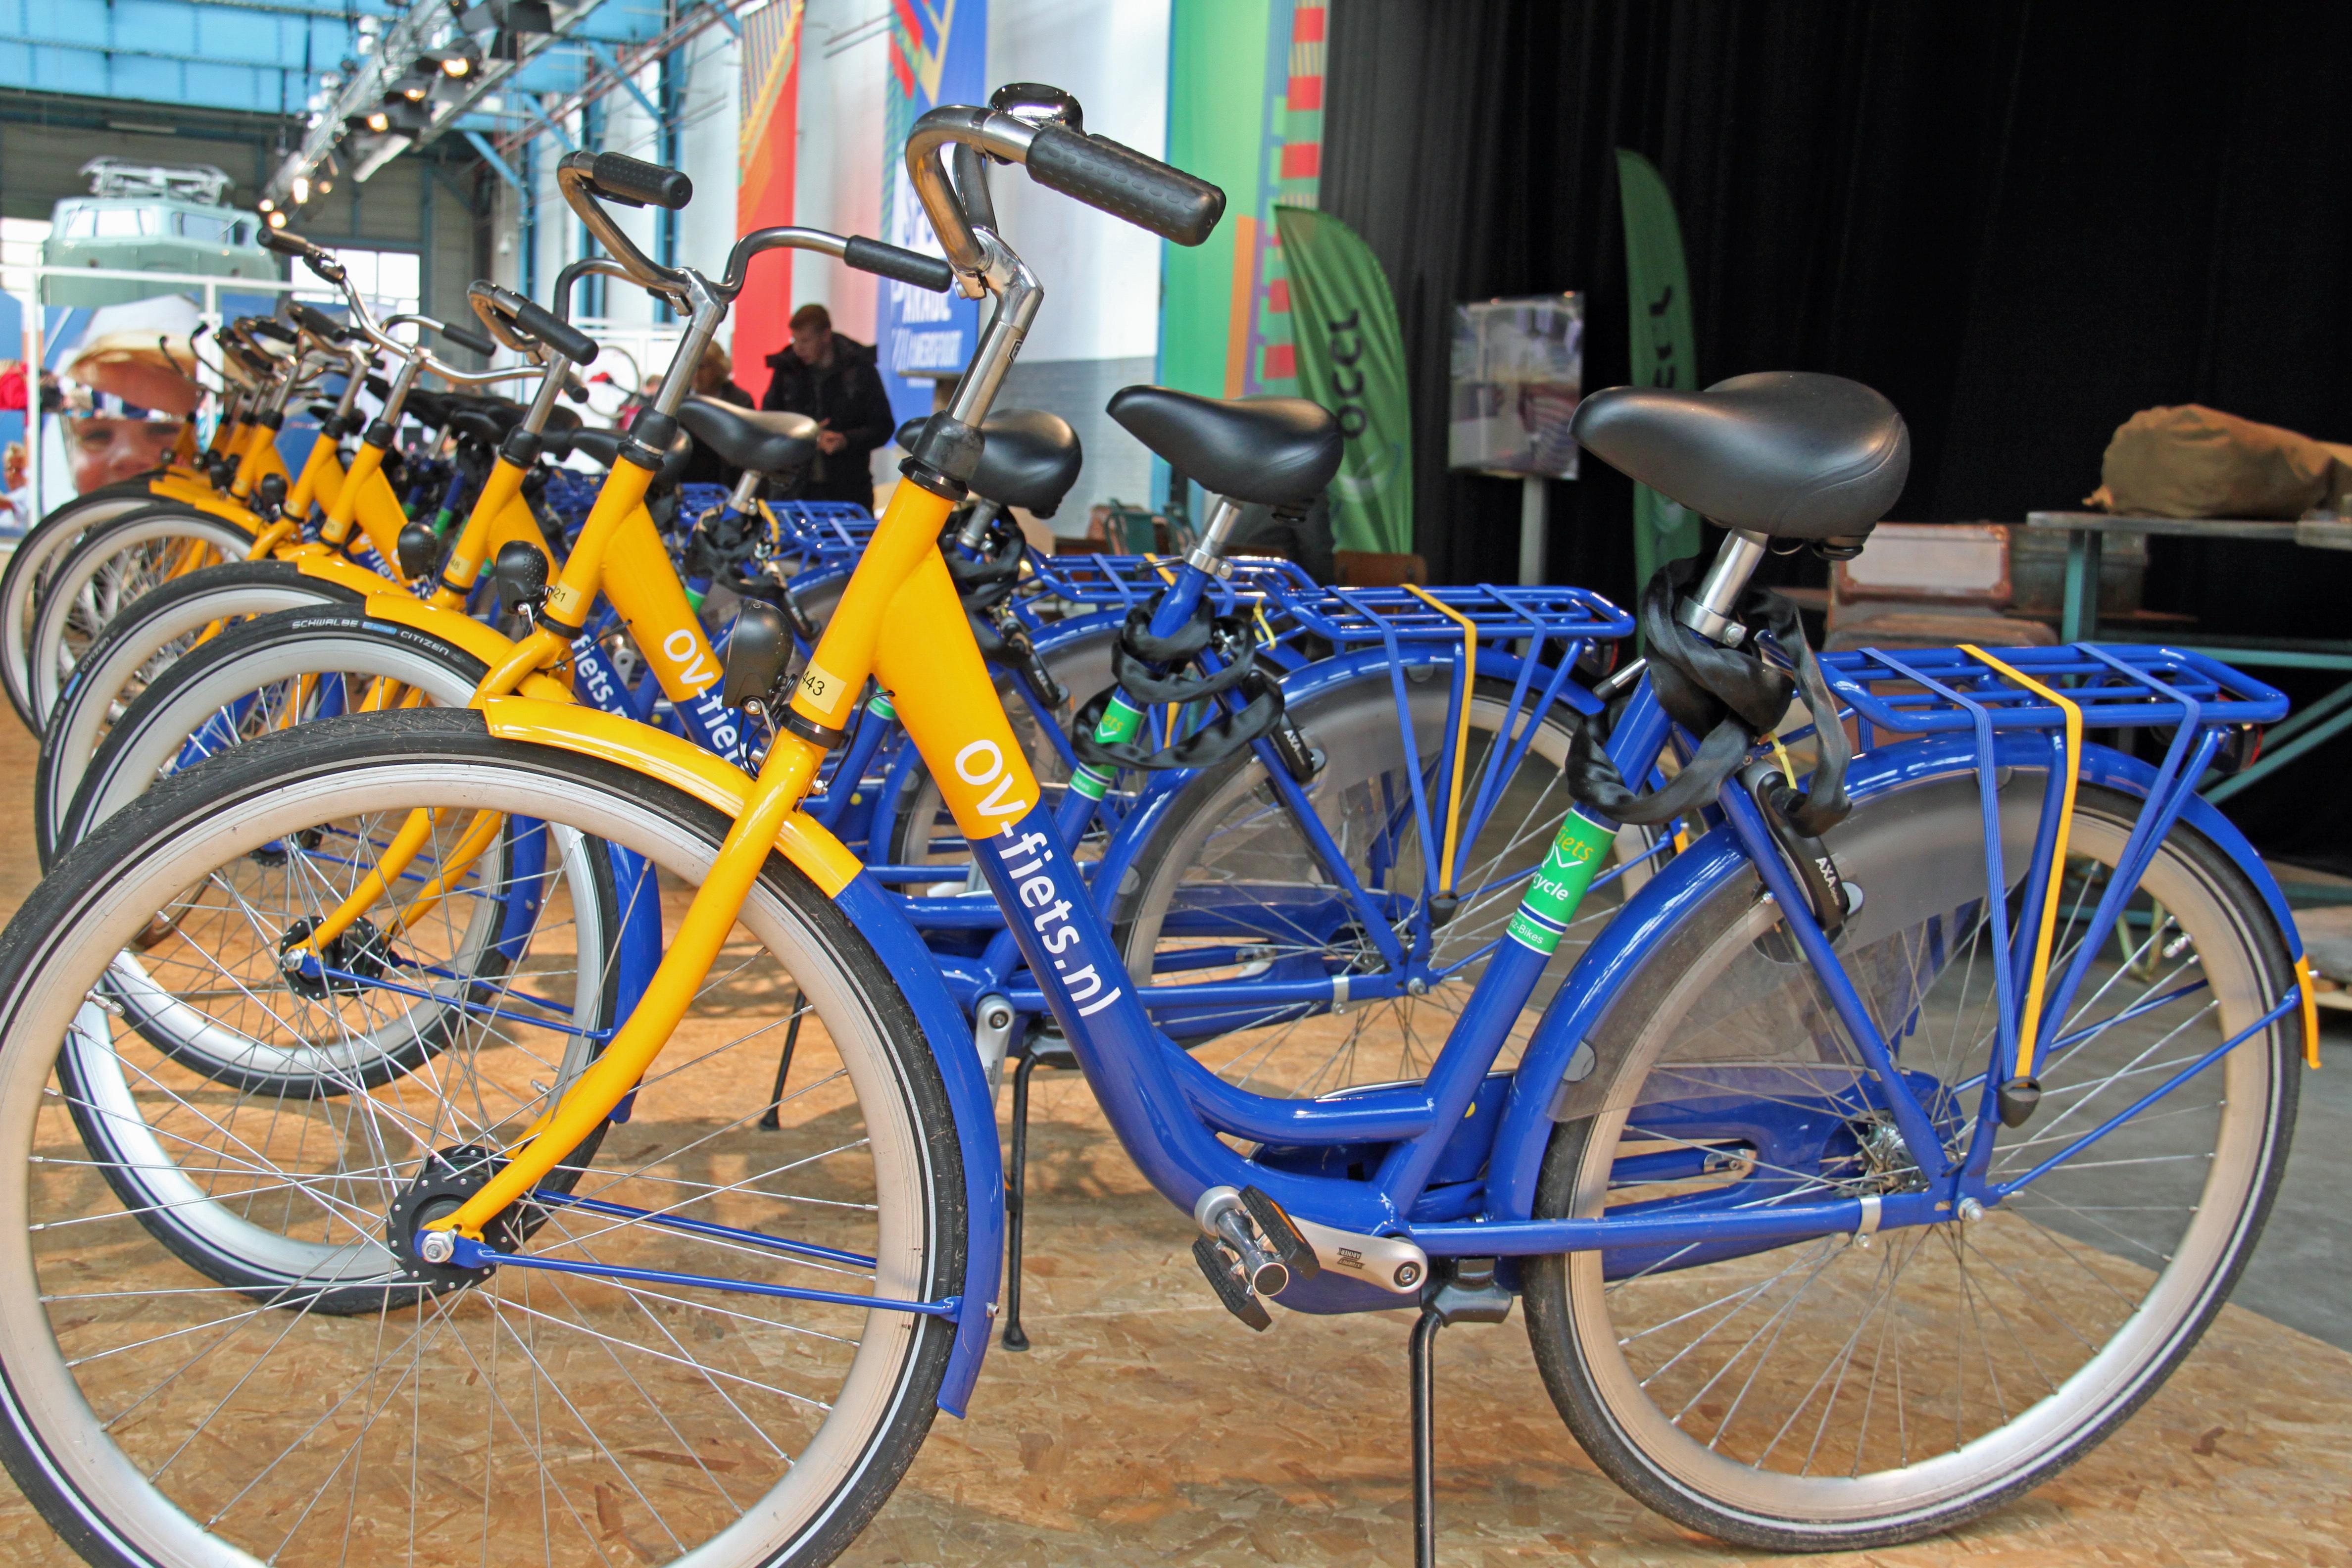 OV-fiets_recycle_Spoorparade.jpg